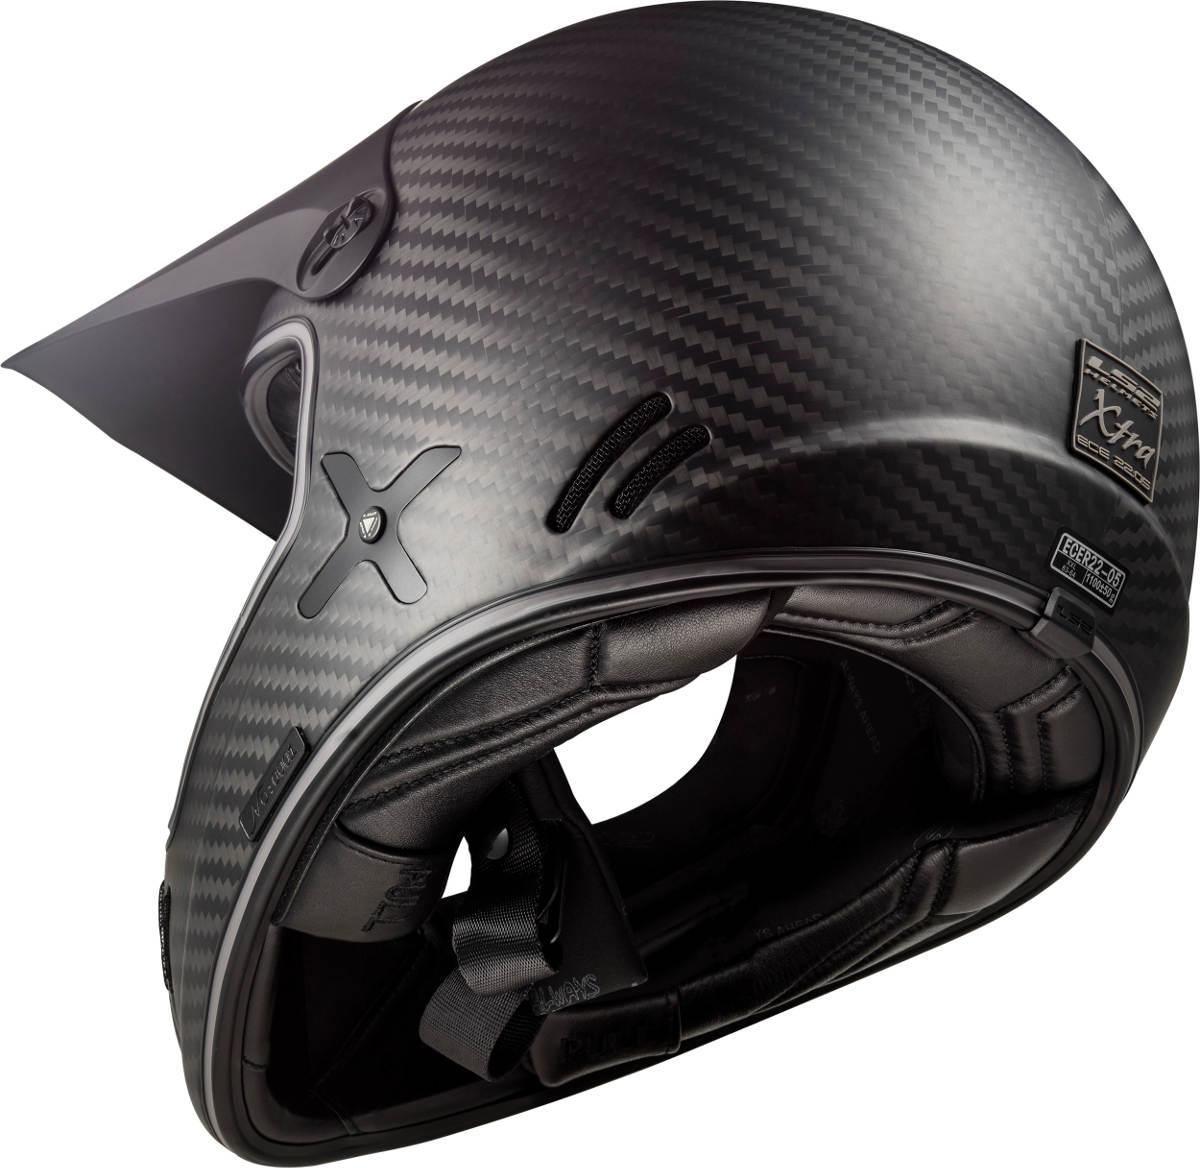 The LS2 Xtra Motorcycle Helmet Rear Underside